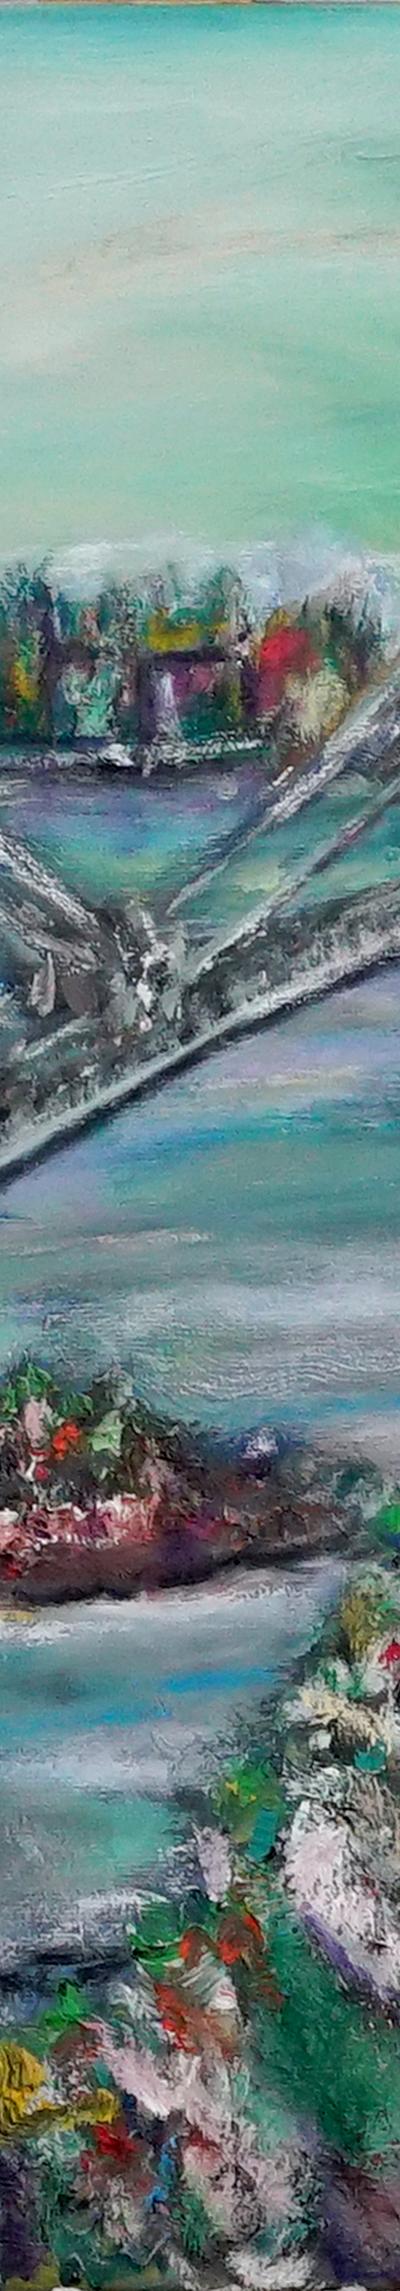 euphrat 50x60 cm, oil on canvas